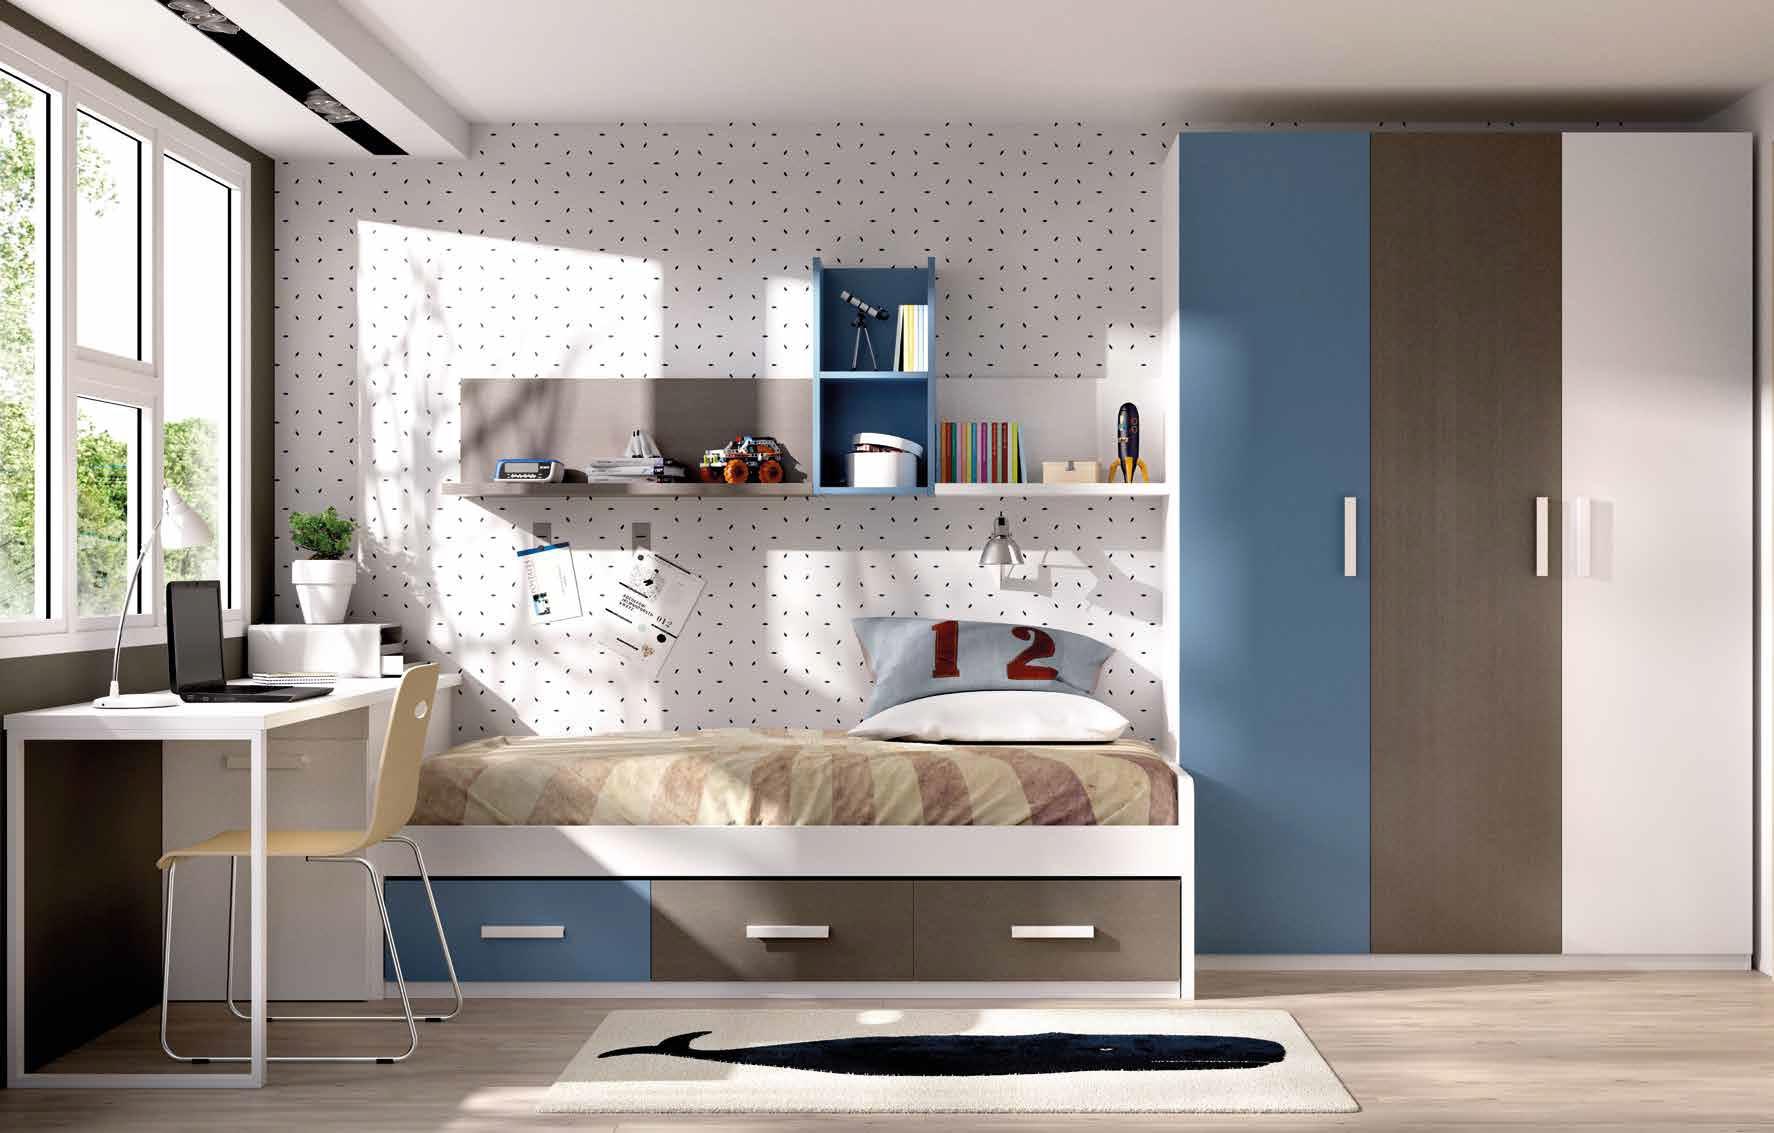 nidos-One-19-muebles-paco-caballero-512-5ccc1704c6702